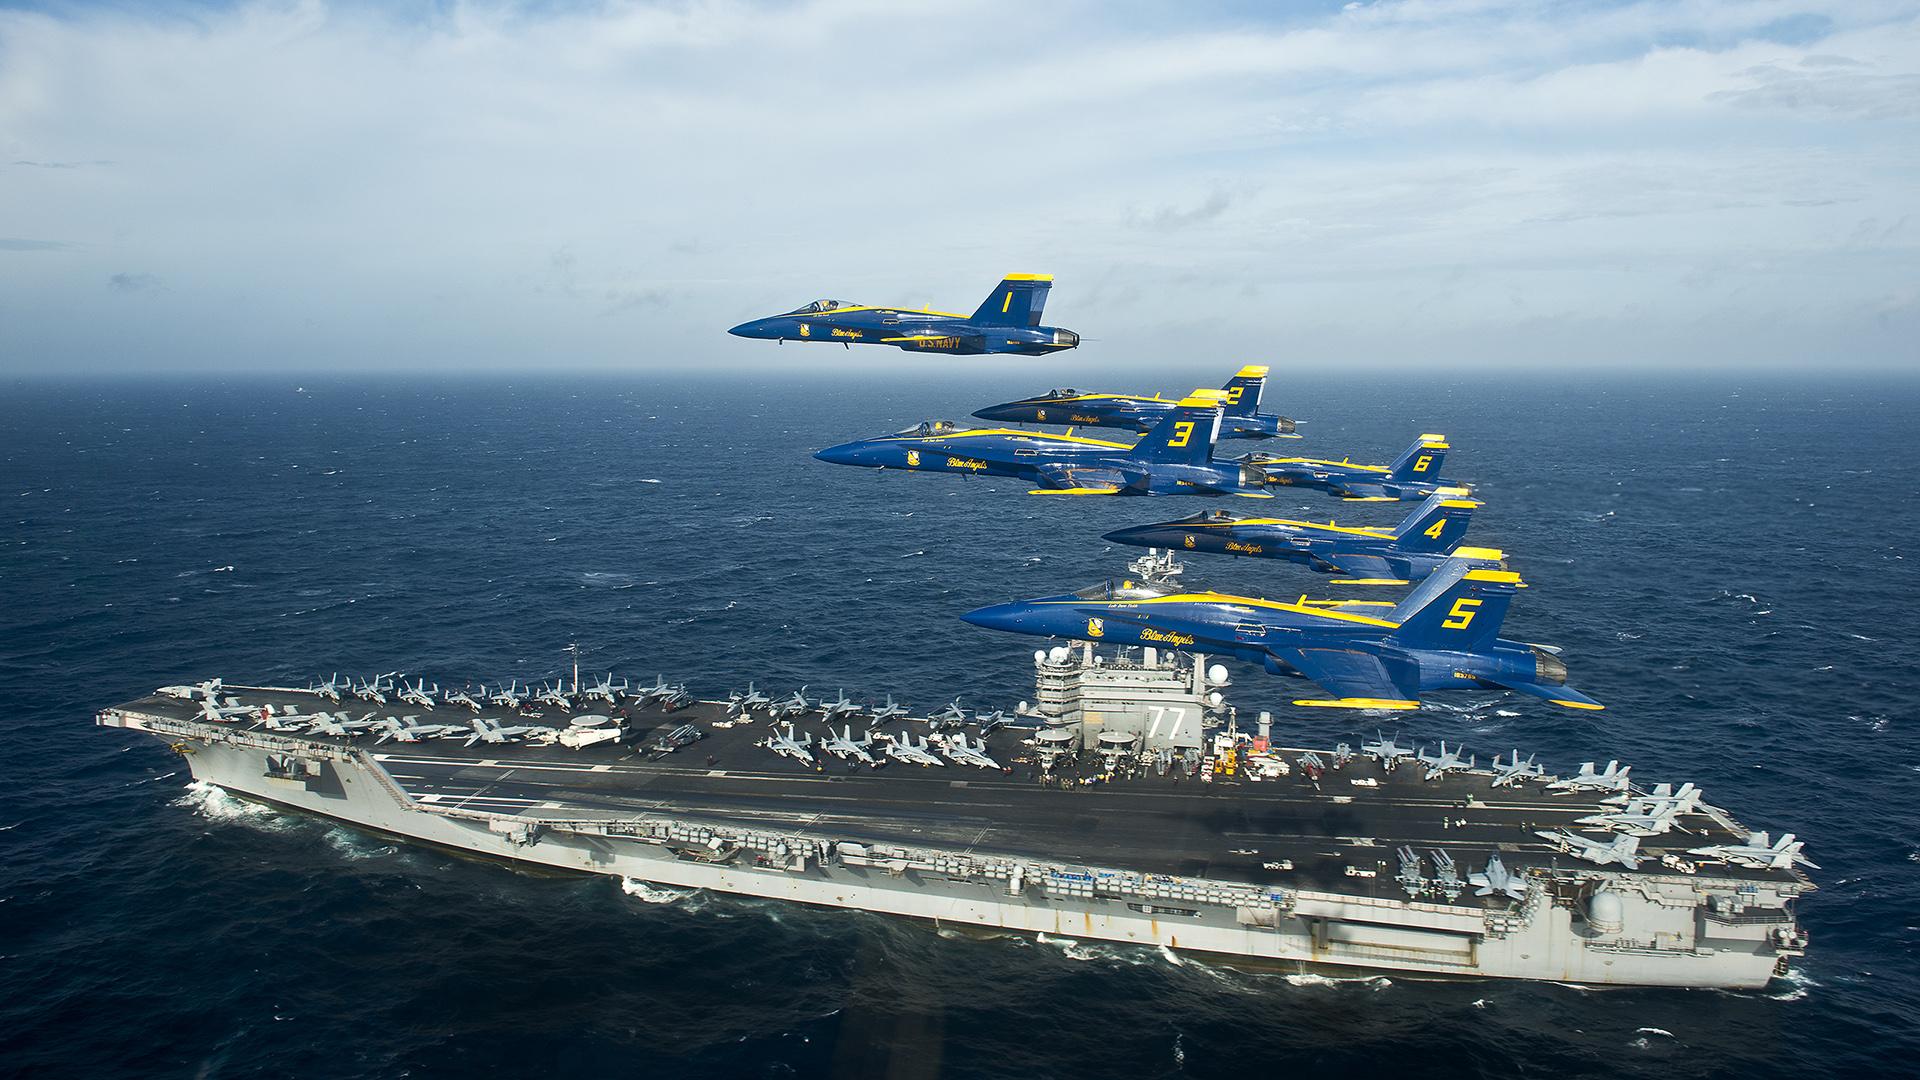 Blue Angels Jet Aircraft Carrier Ocean military wallpaper background 1920x1080